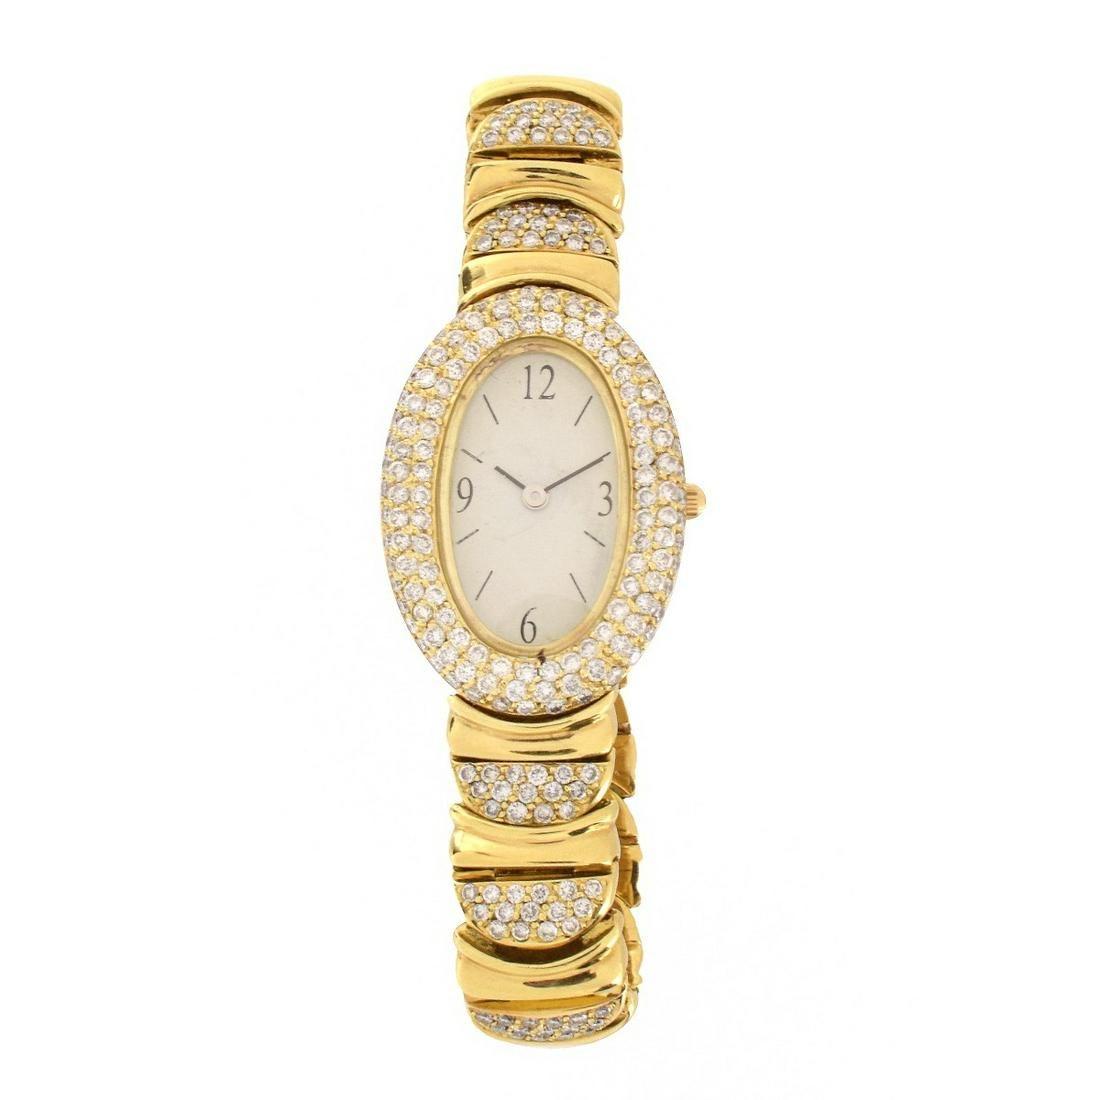 Diamond and 18K Watch